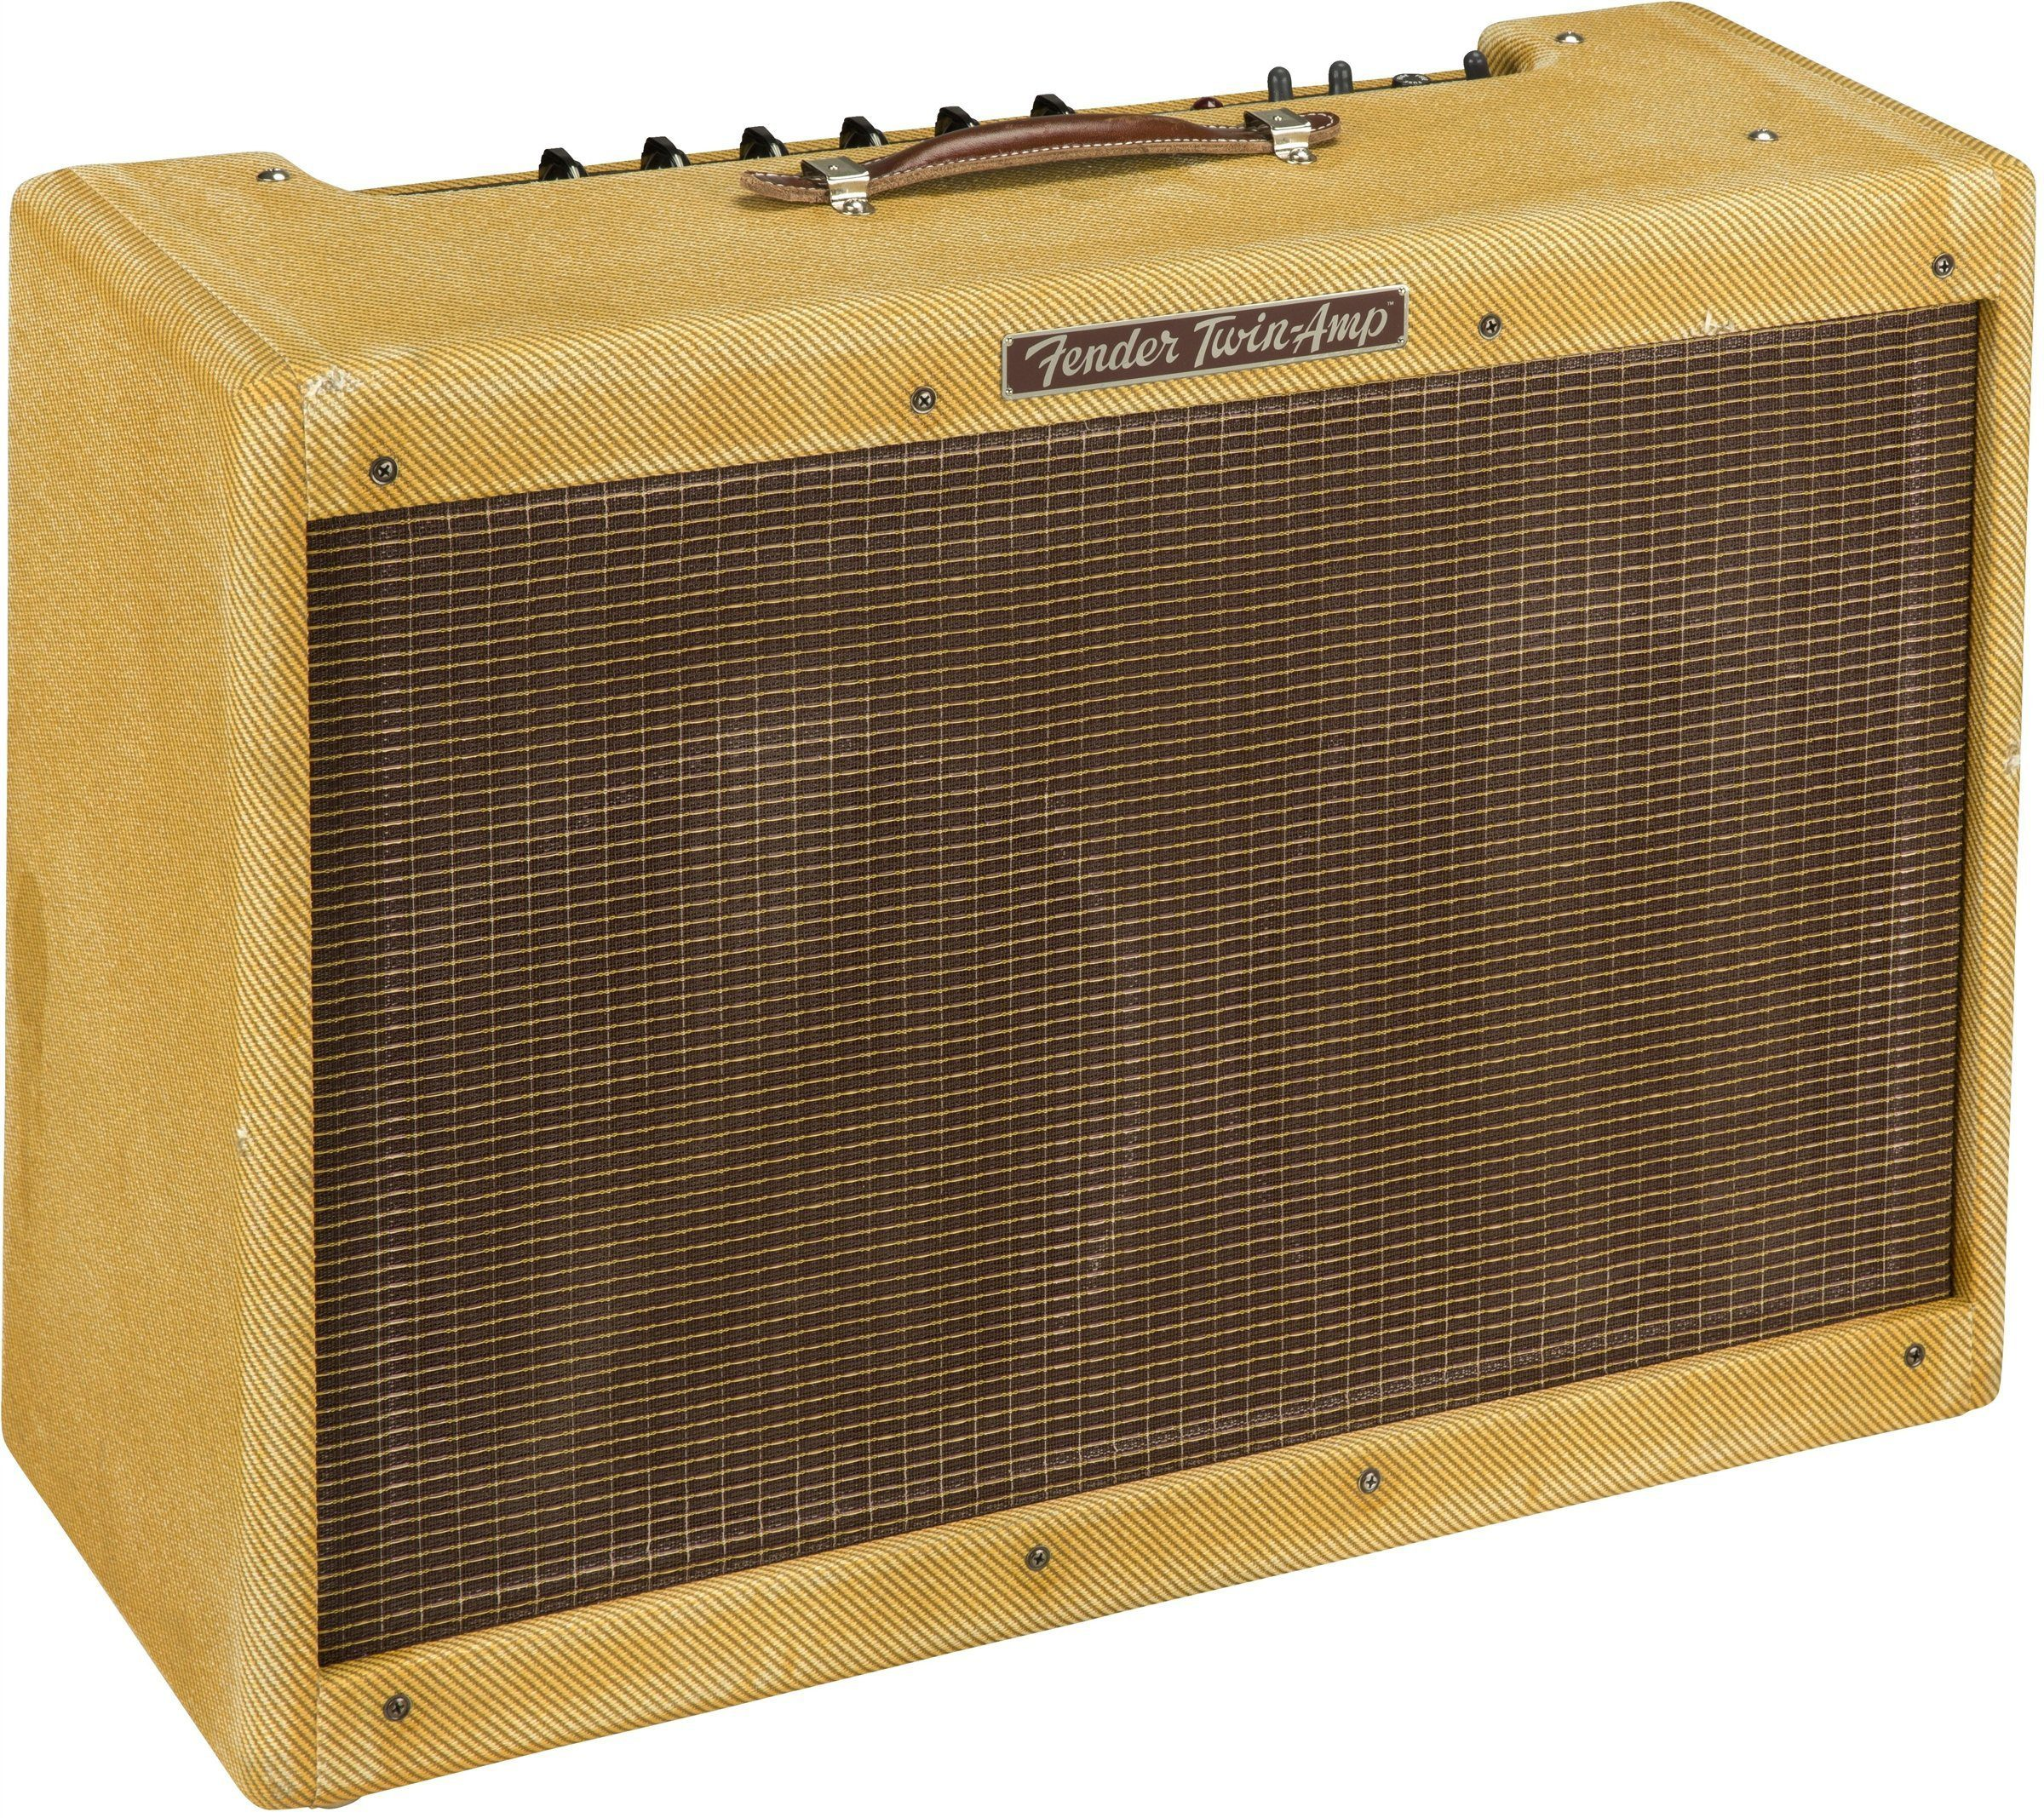 Fender Joe Bonamassa Twin-Amp